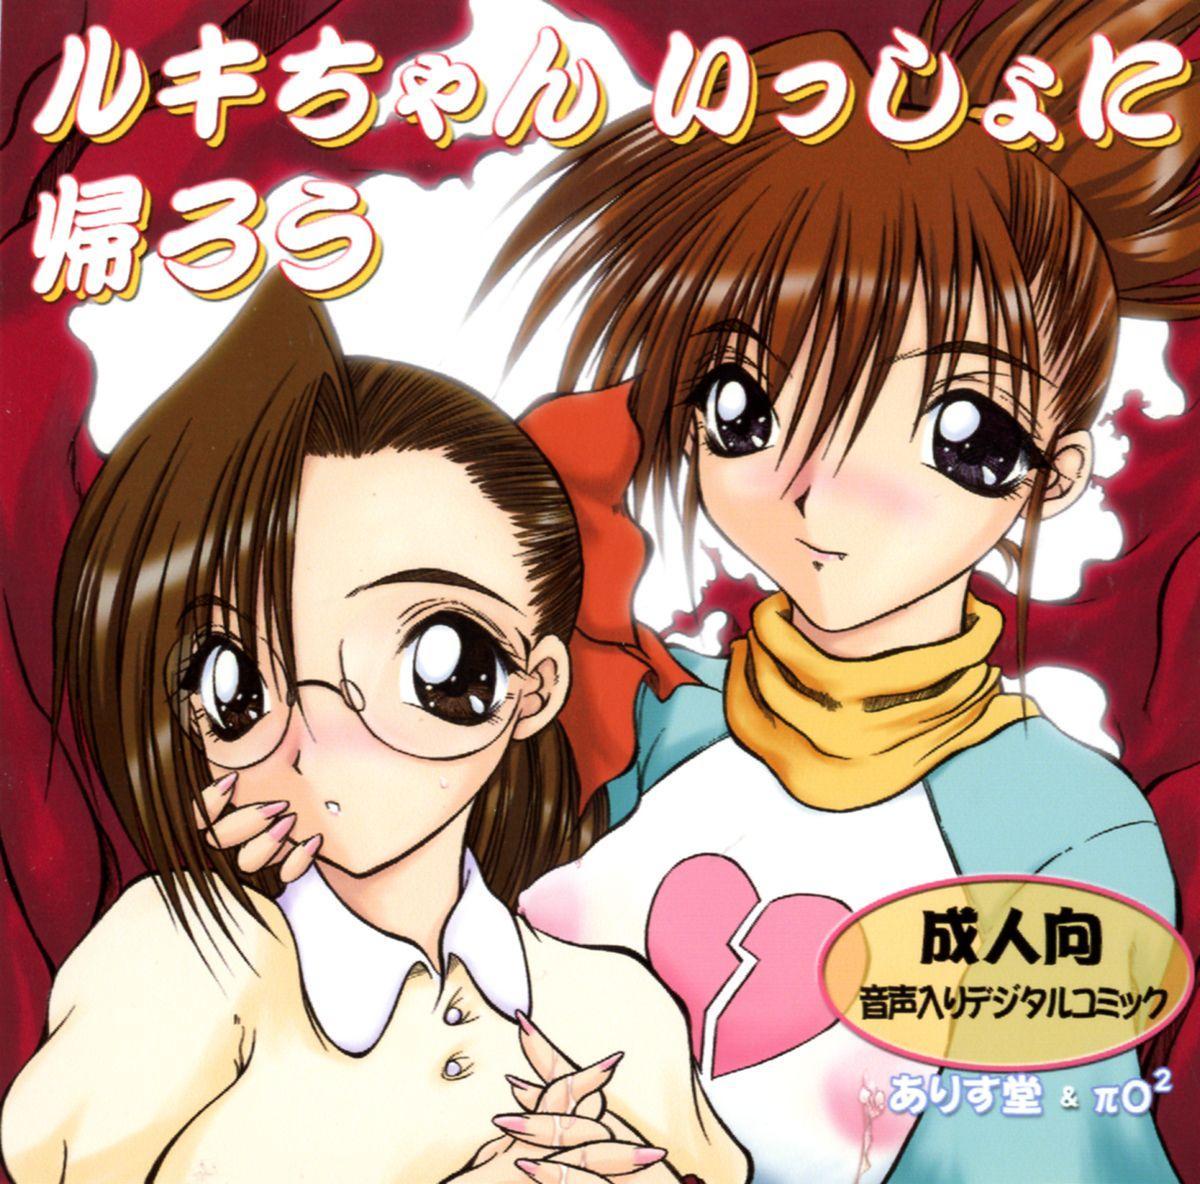 Ruki-chan Issho ni Kaerou 0